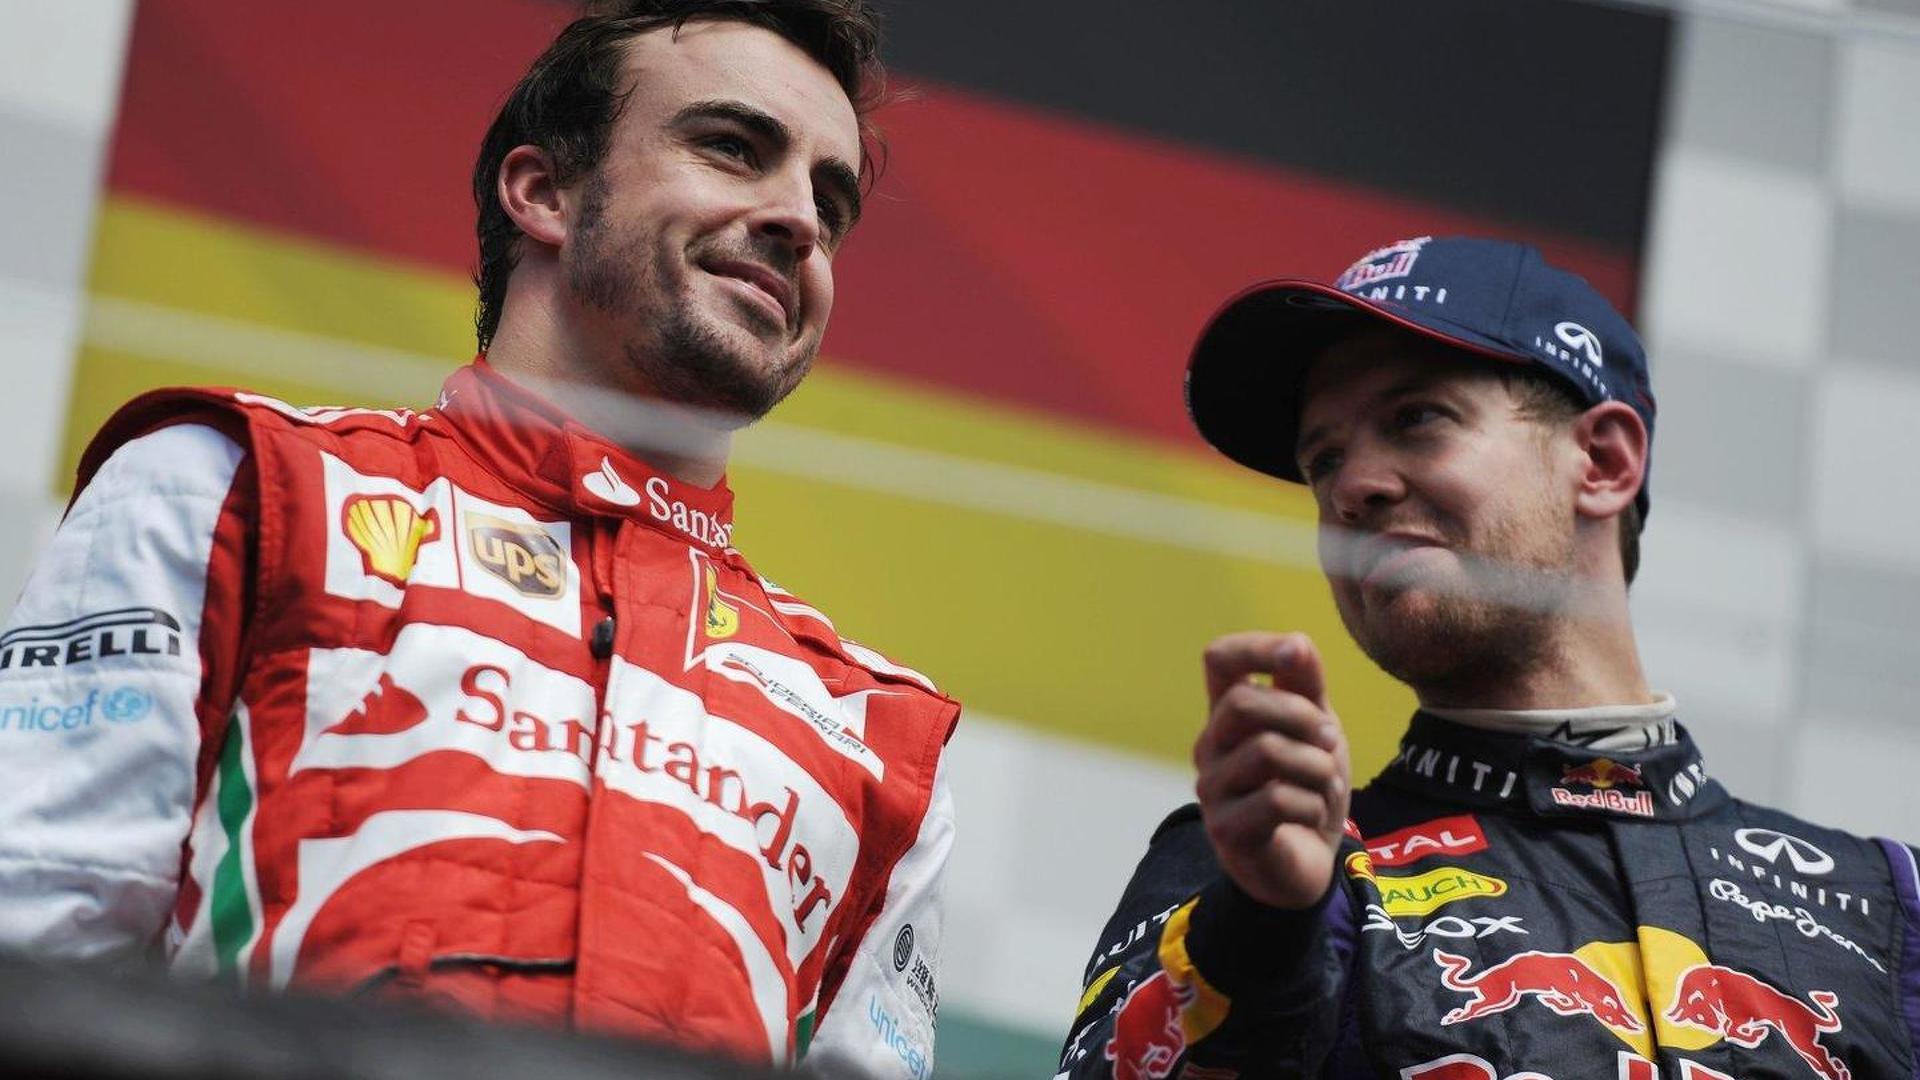 Vettel 'not afraid' of Alonso head-to-head